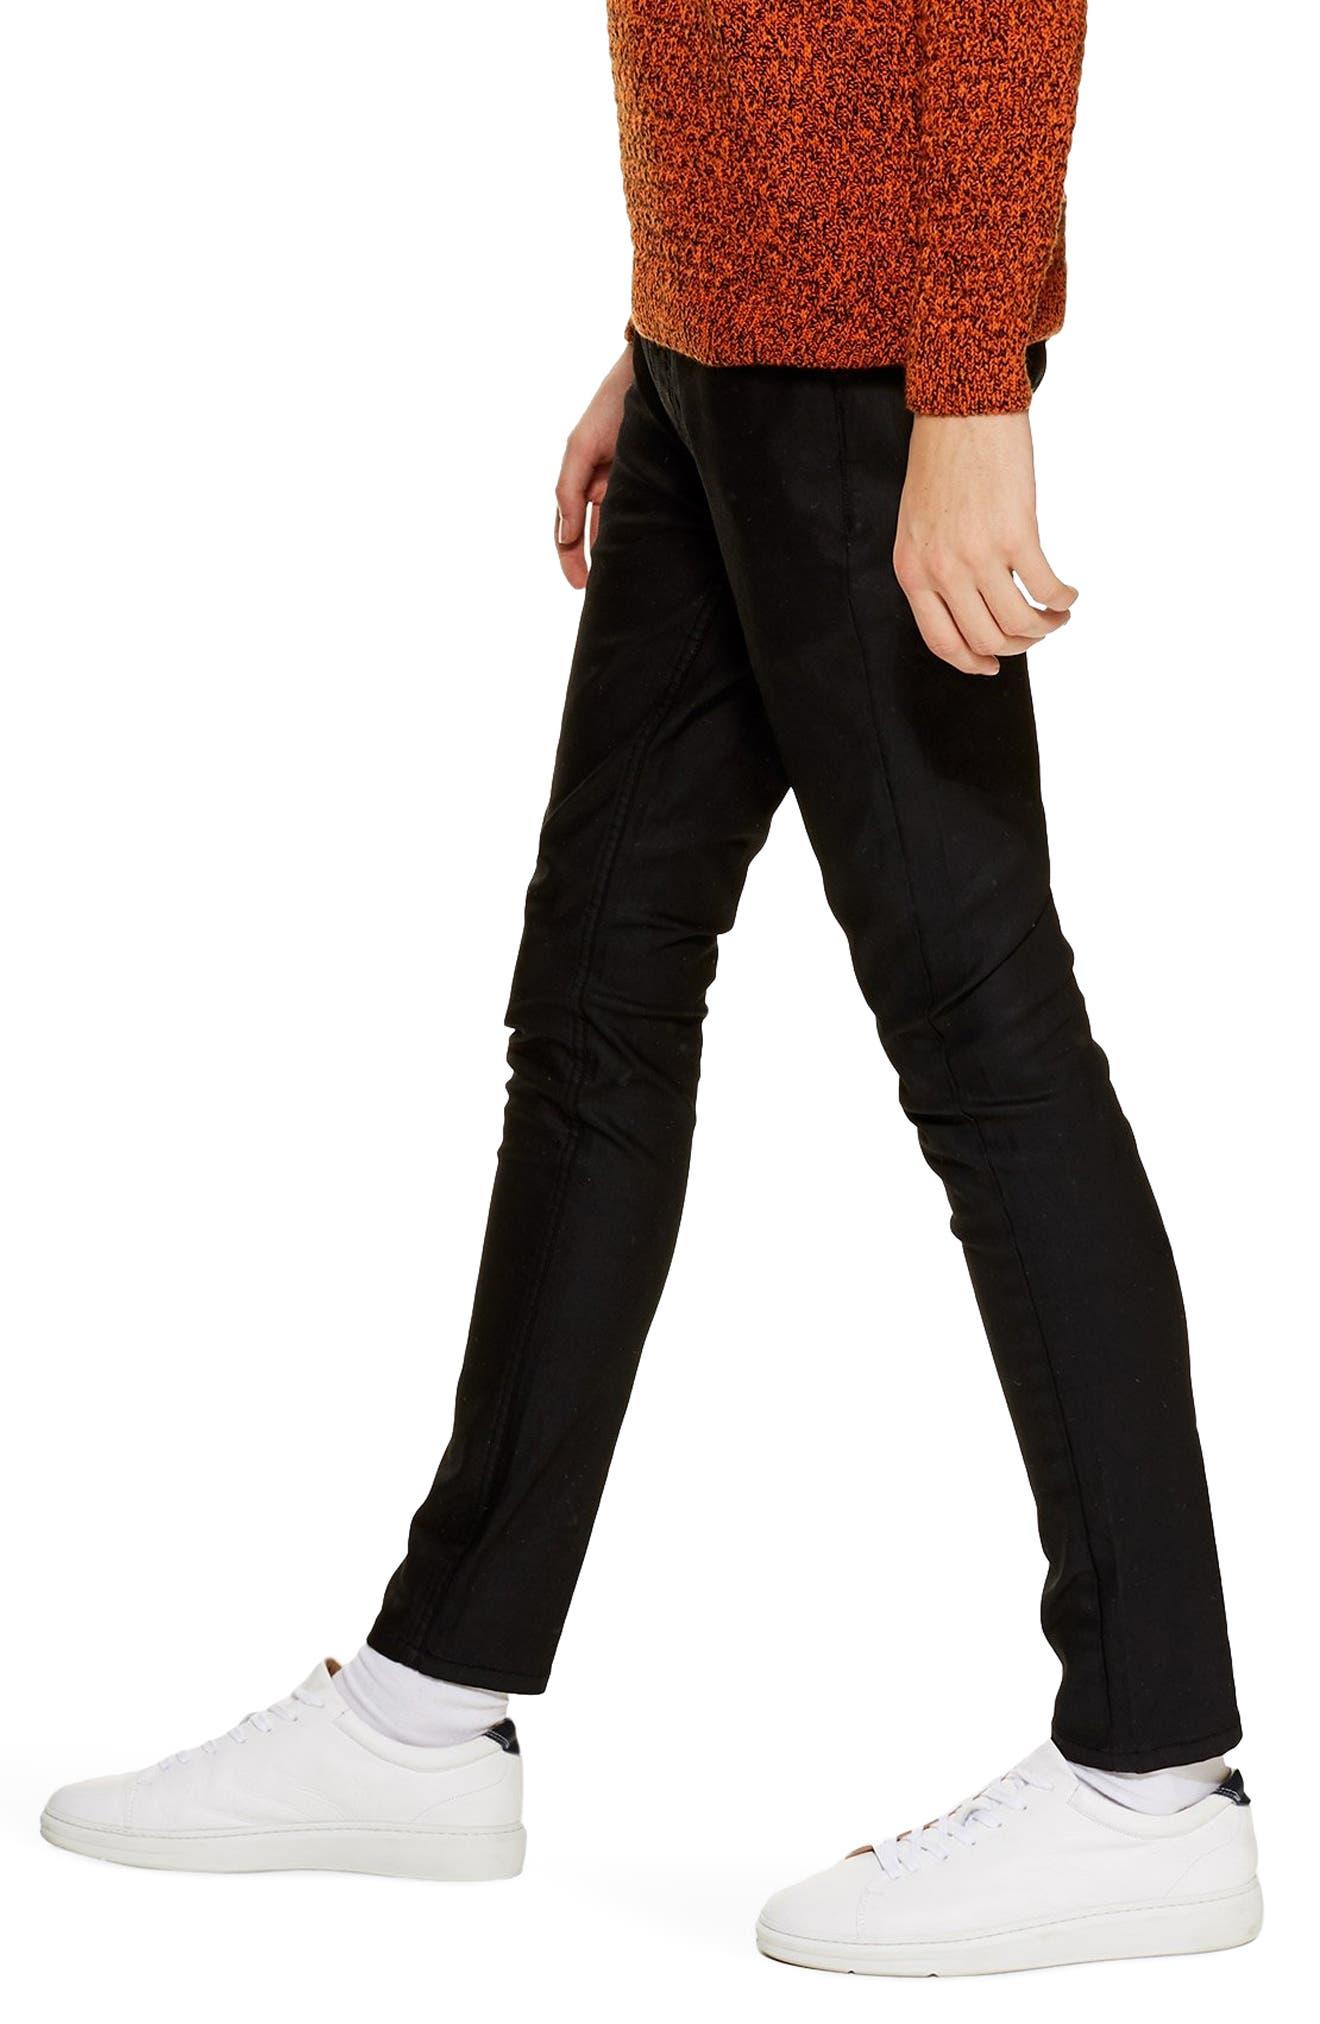 TOPMAN, Coated Denim Skinny Jeans, Alternate thumbnail 4, color, BLACK